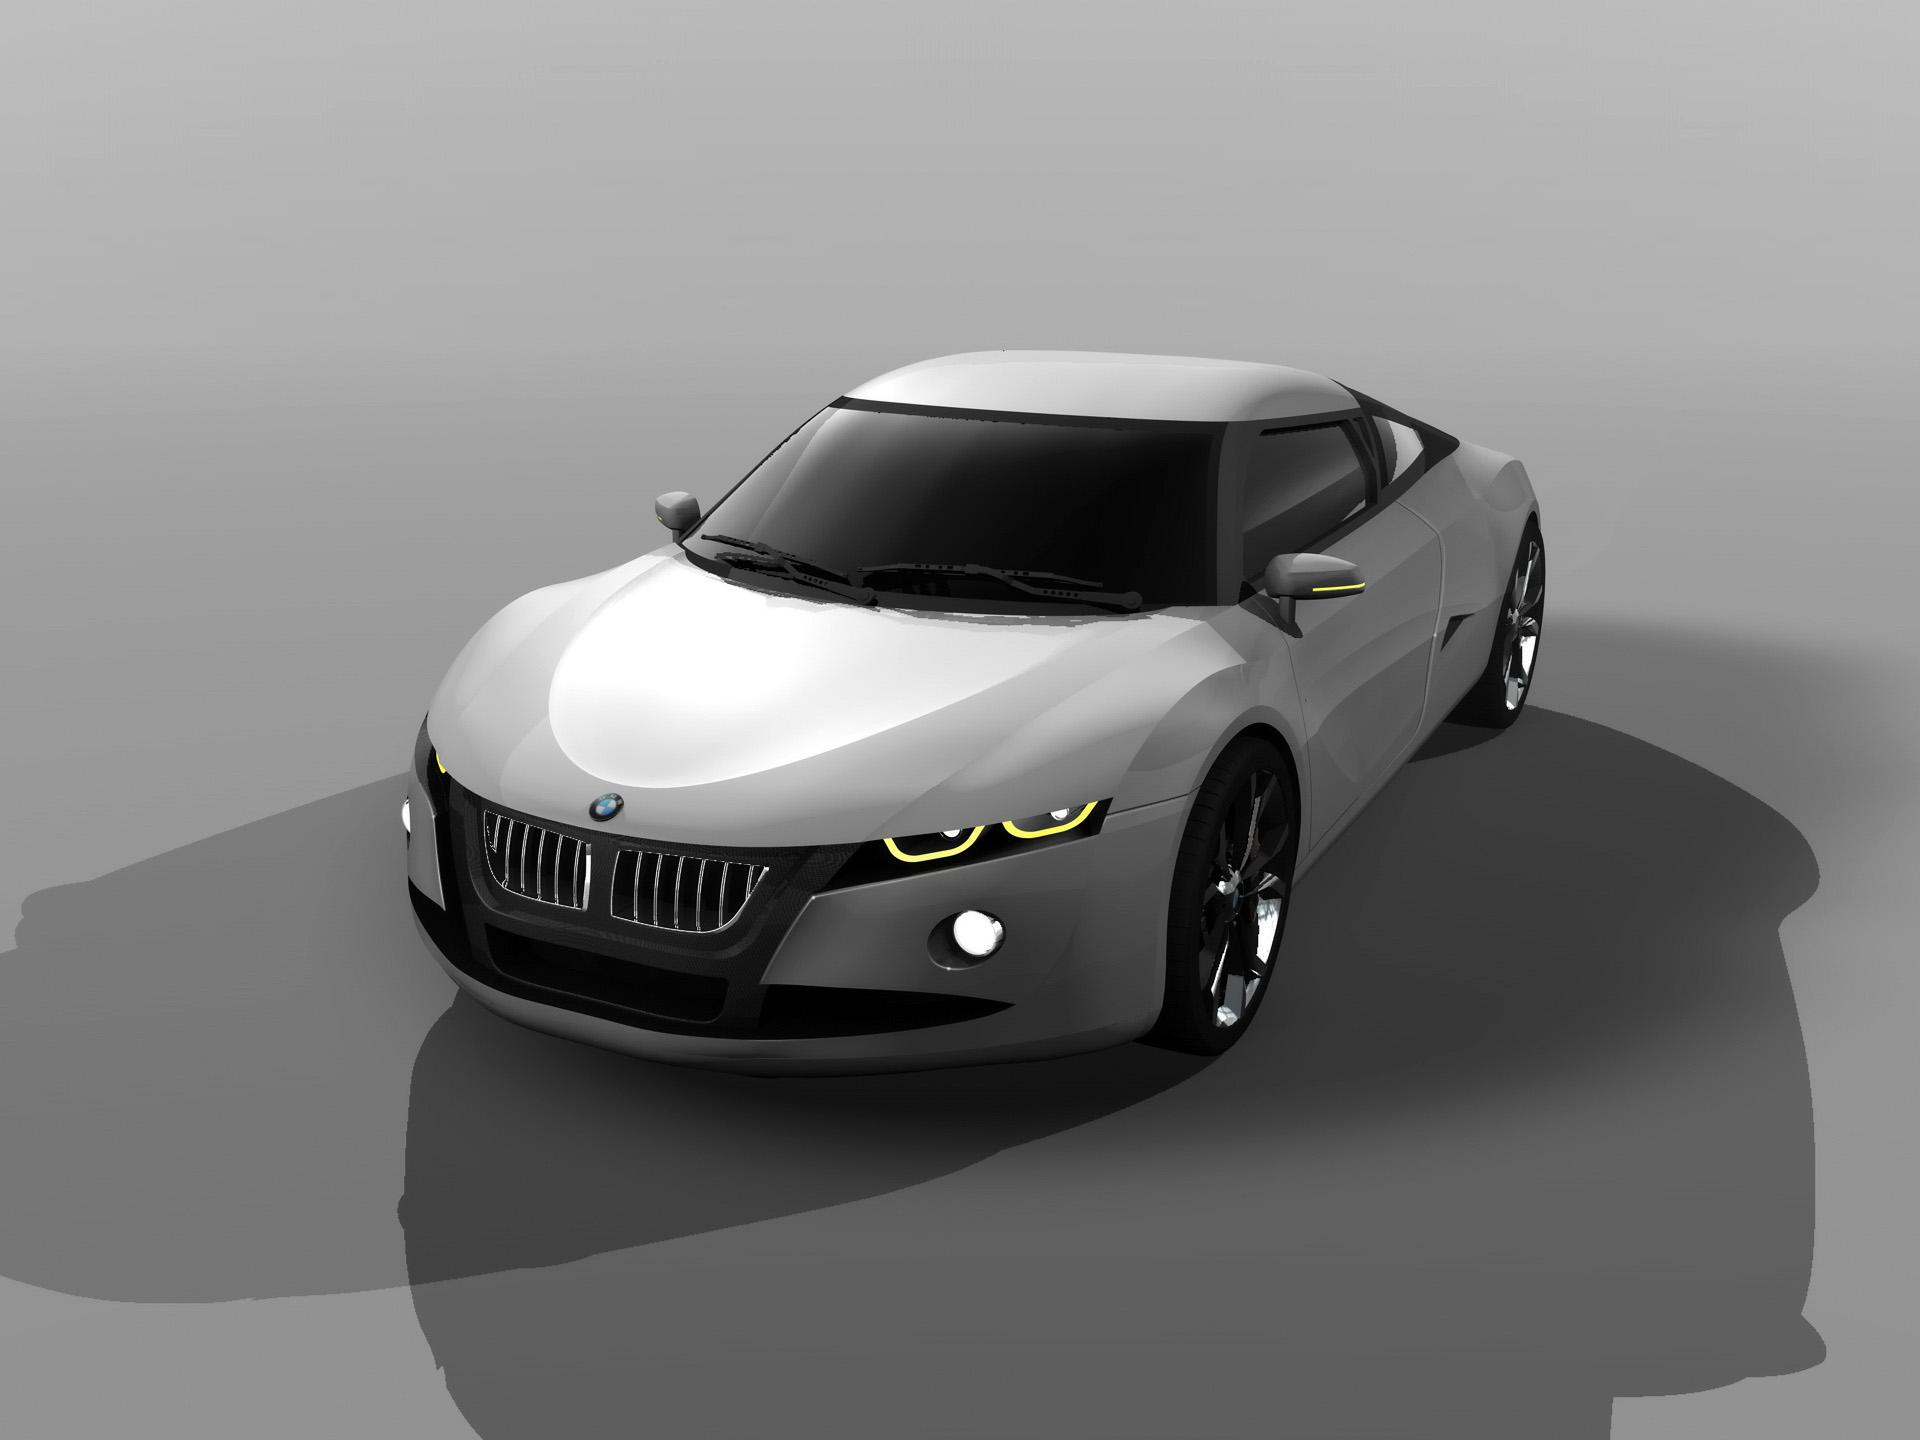 2010 BMW M2 Concept Design of Amadou Ndiaye   Front Angle Top 1920x1440